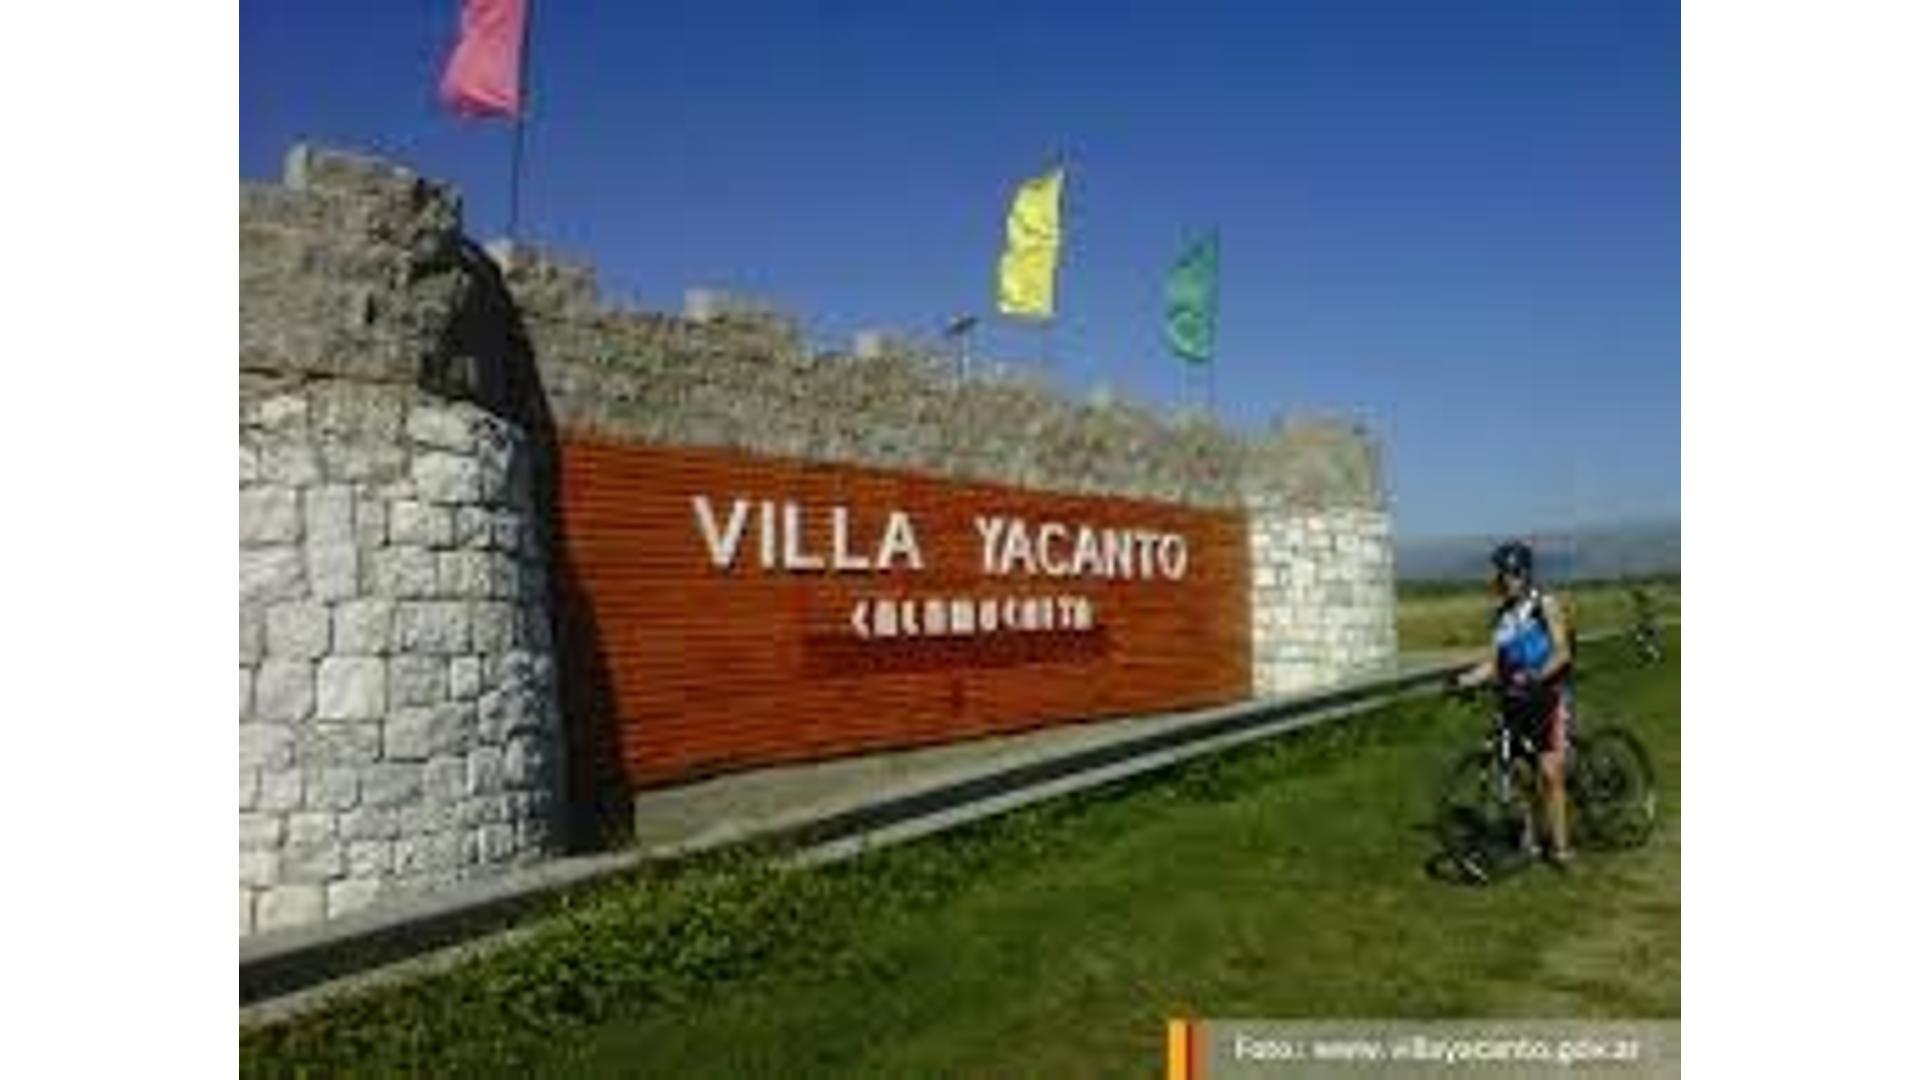 Villa Yacanto, Cordoba 100 - U$D 29.000 - Terreno en Venta